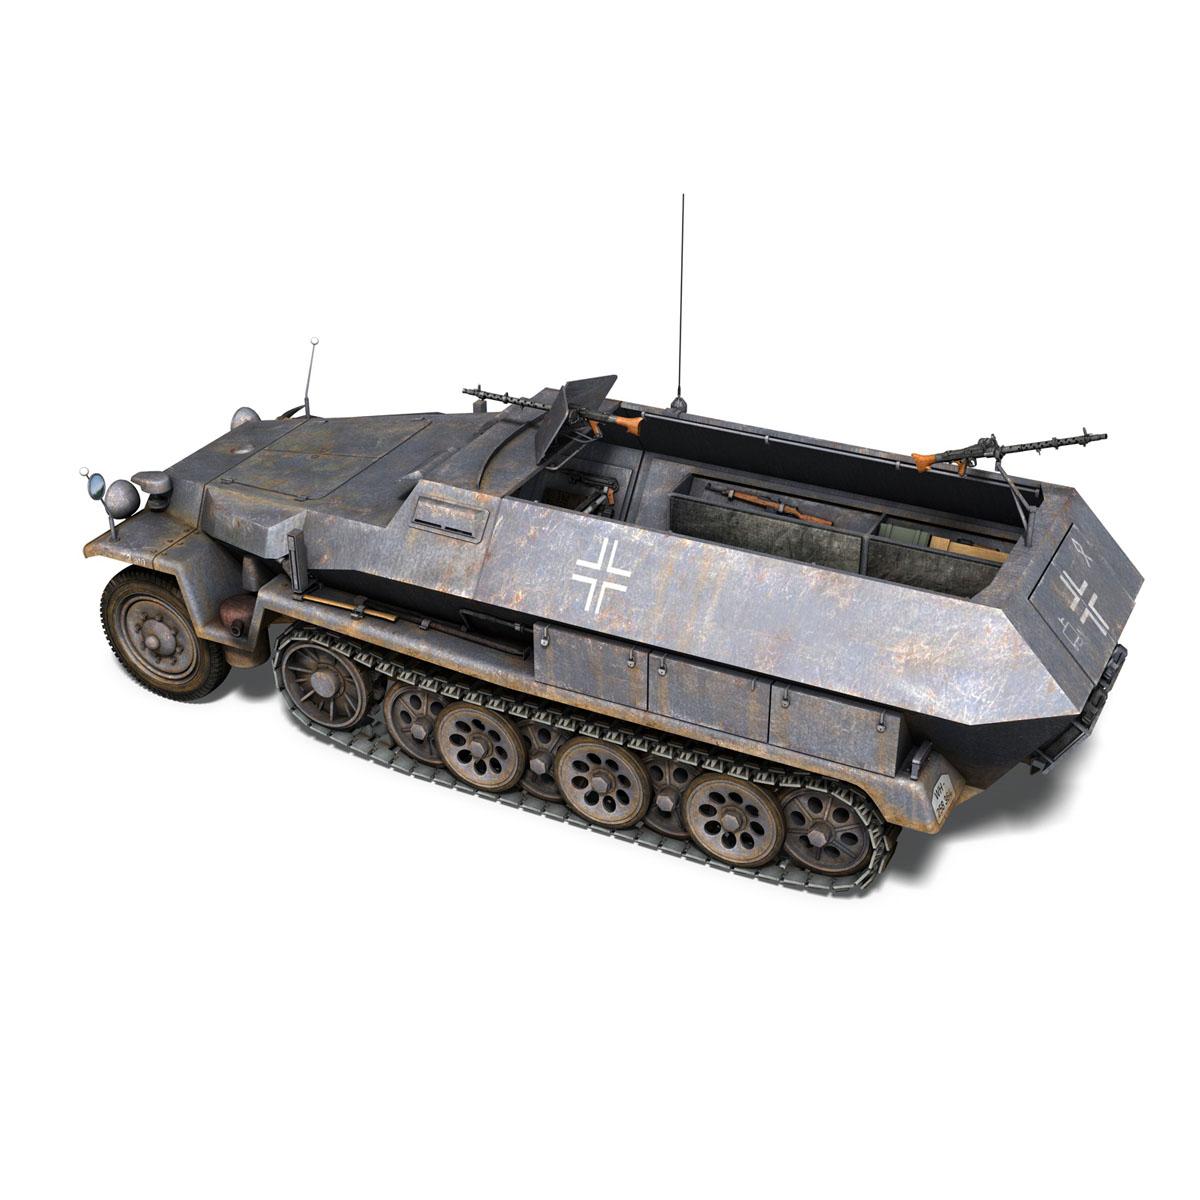 sd.kfz 251 1 ausf.c – half-track 3d model 3ds fbx c4d lwo obj 201393